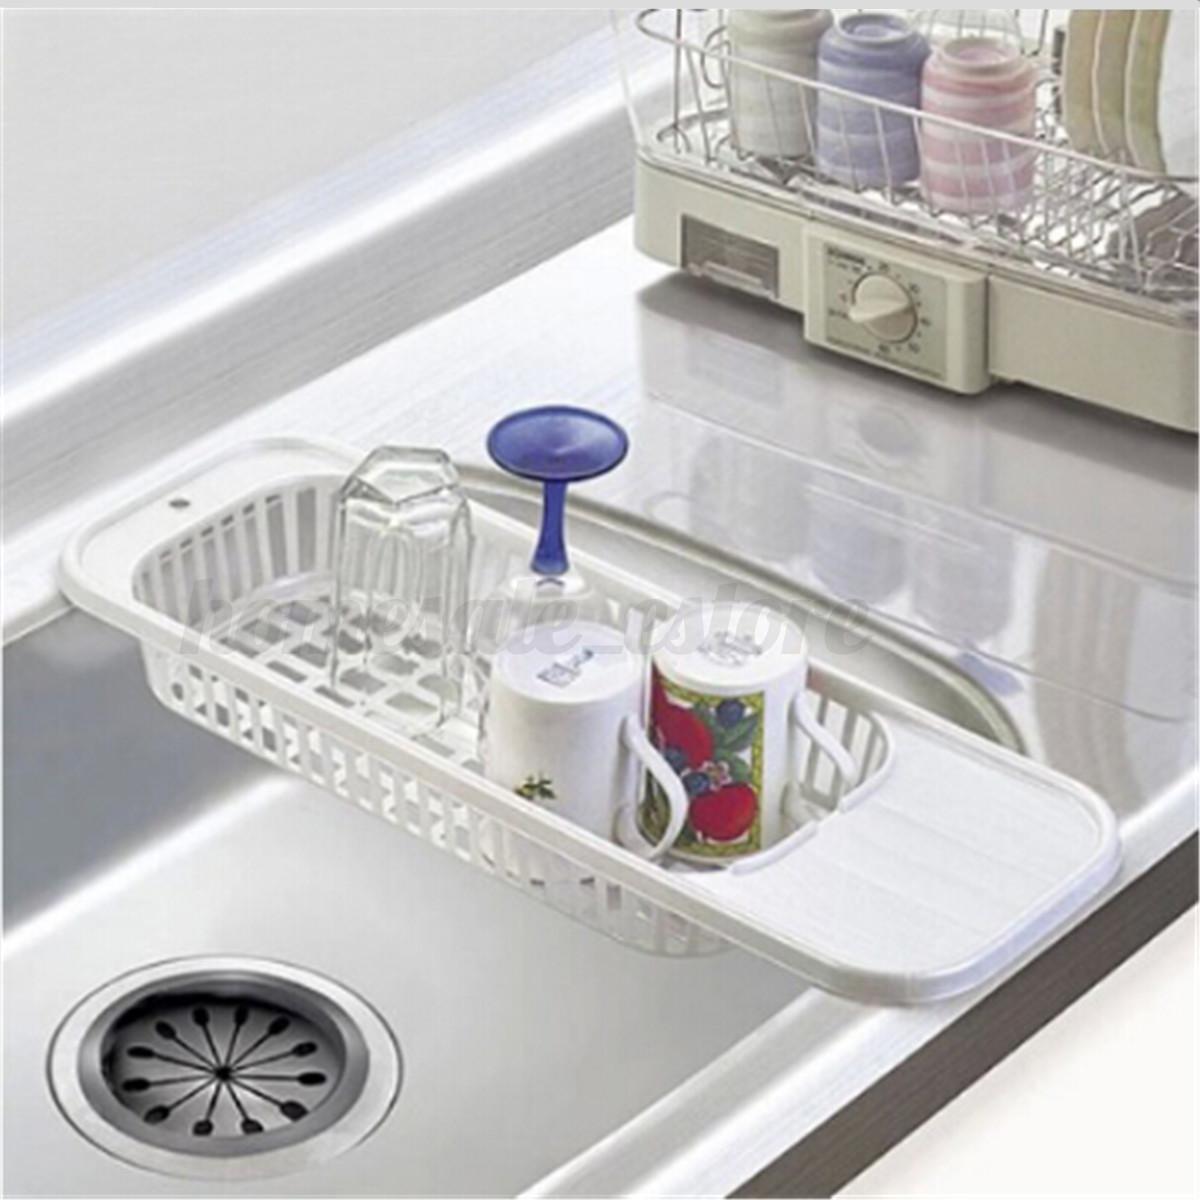 Kitchen Sink Dish Rack Insert Countertop Organizer Rack Dish Drying Rack Drainer Ebay